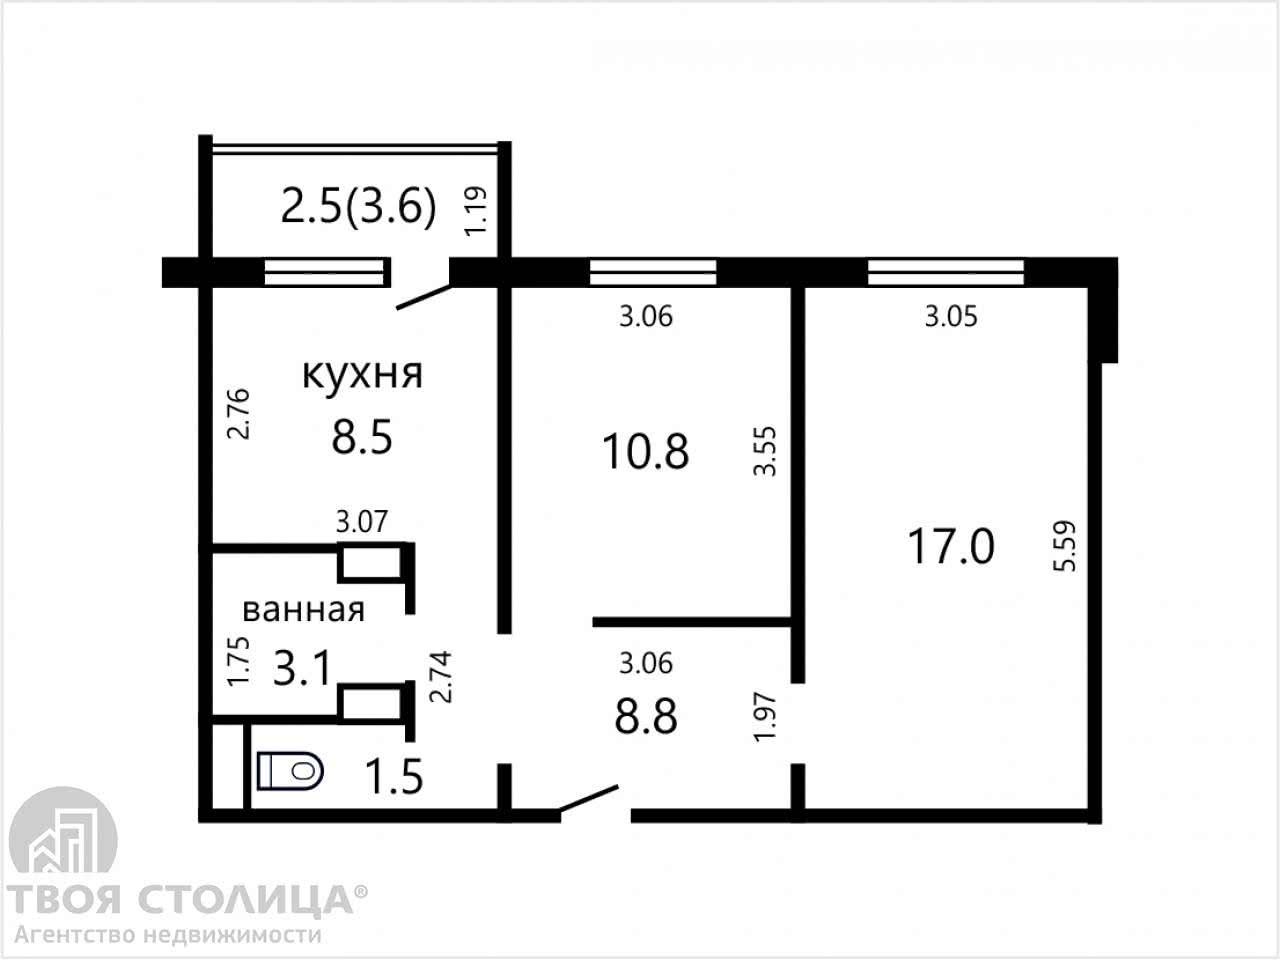 Продажа 2-комнатной квартиры в Минске, ул. Академика Карского, д. 21 - фото 2